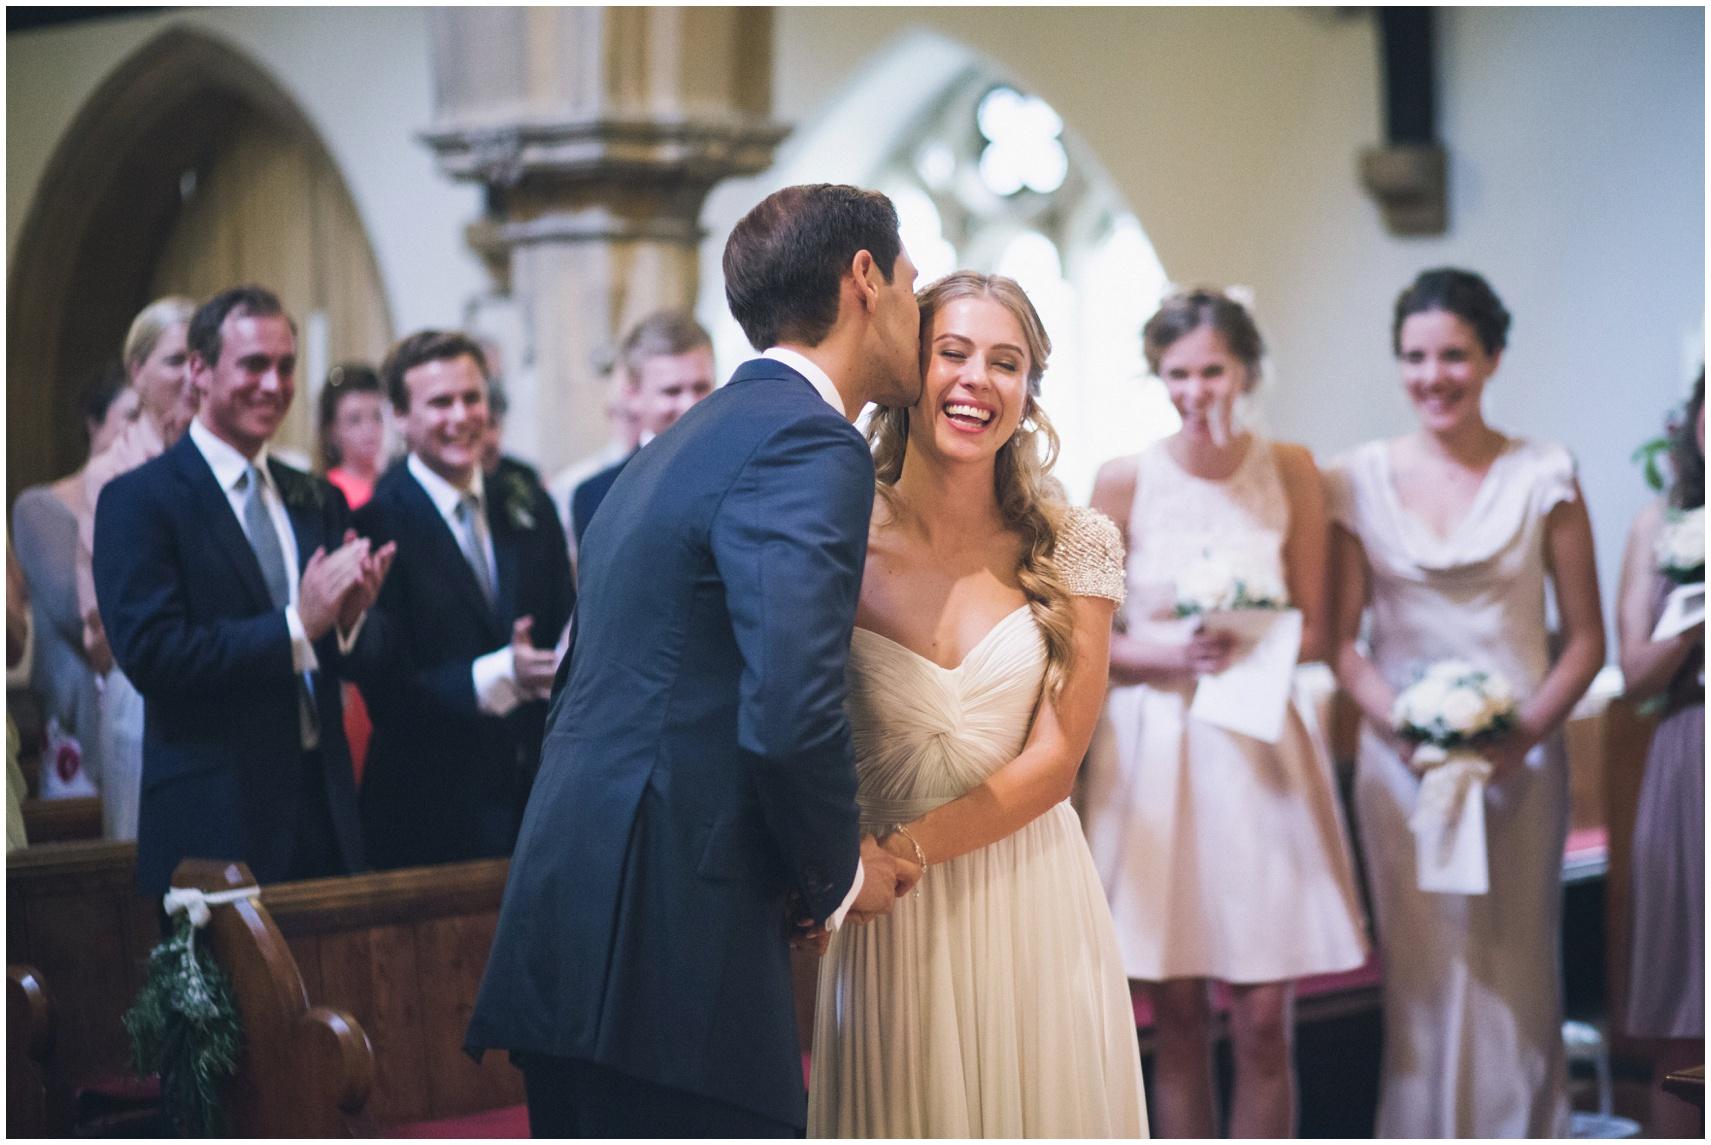 BMC Wedding photography Rutland_0290.jpg